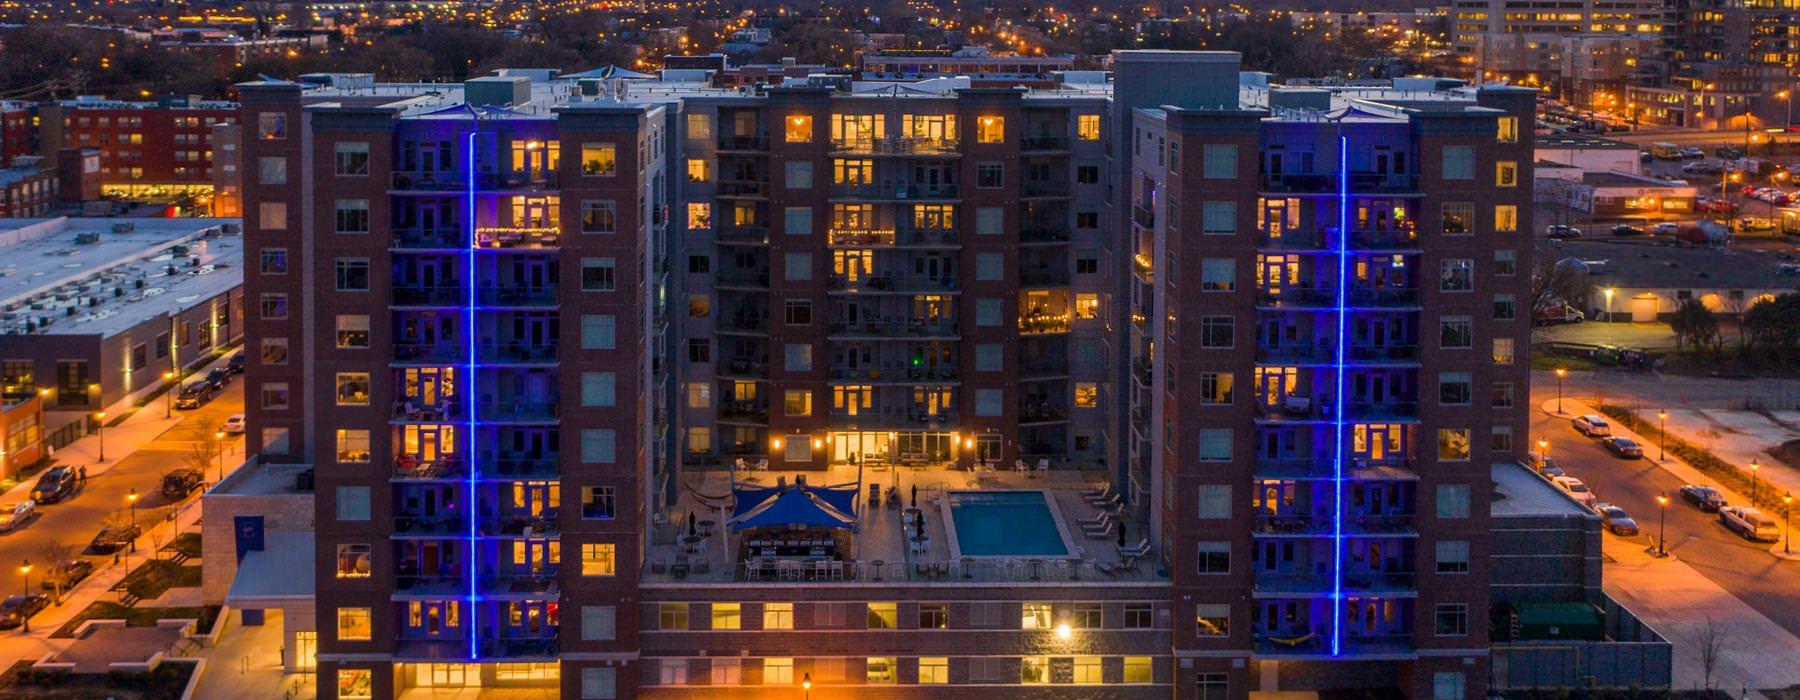 evening shot of River's Edge building lit up